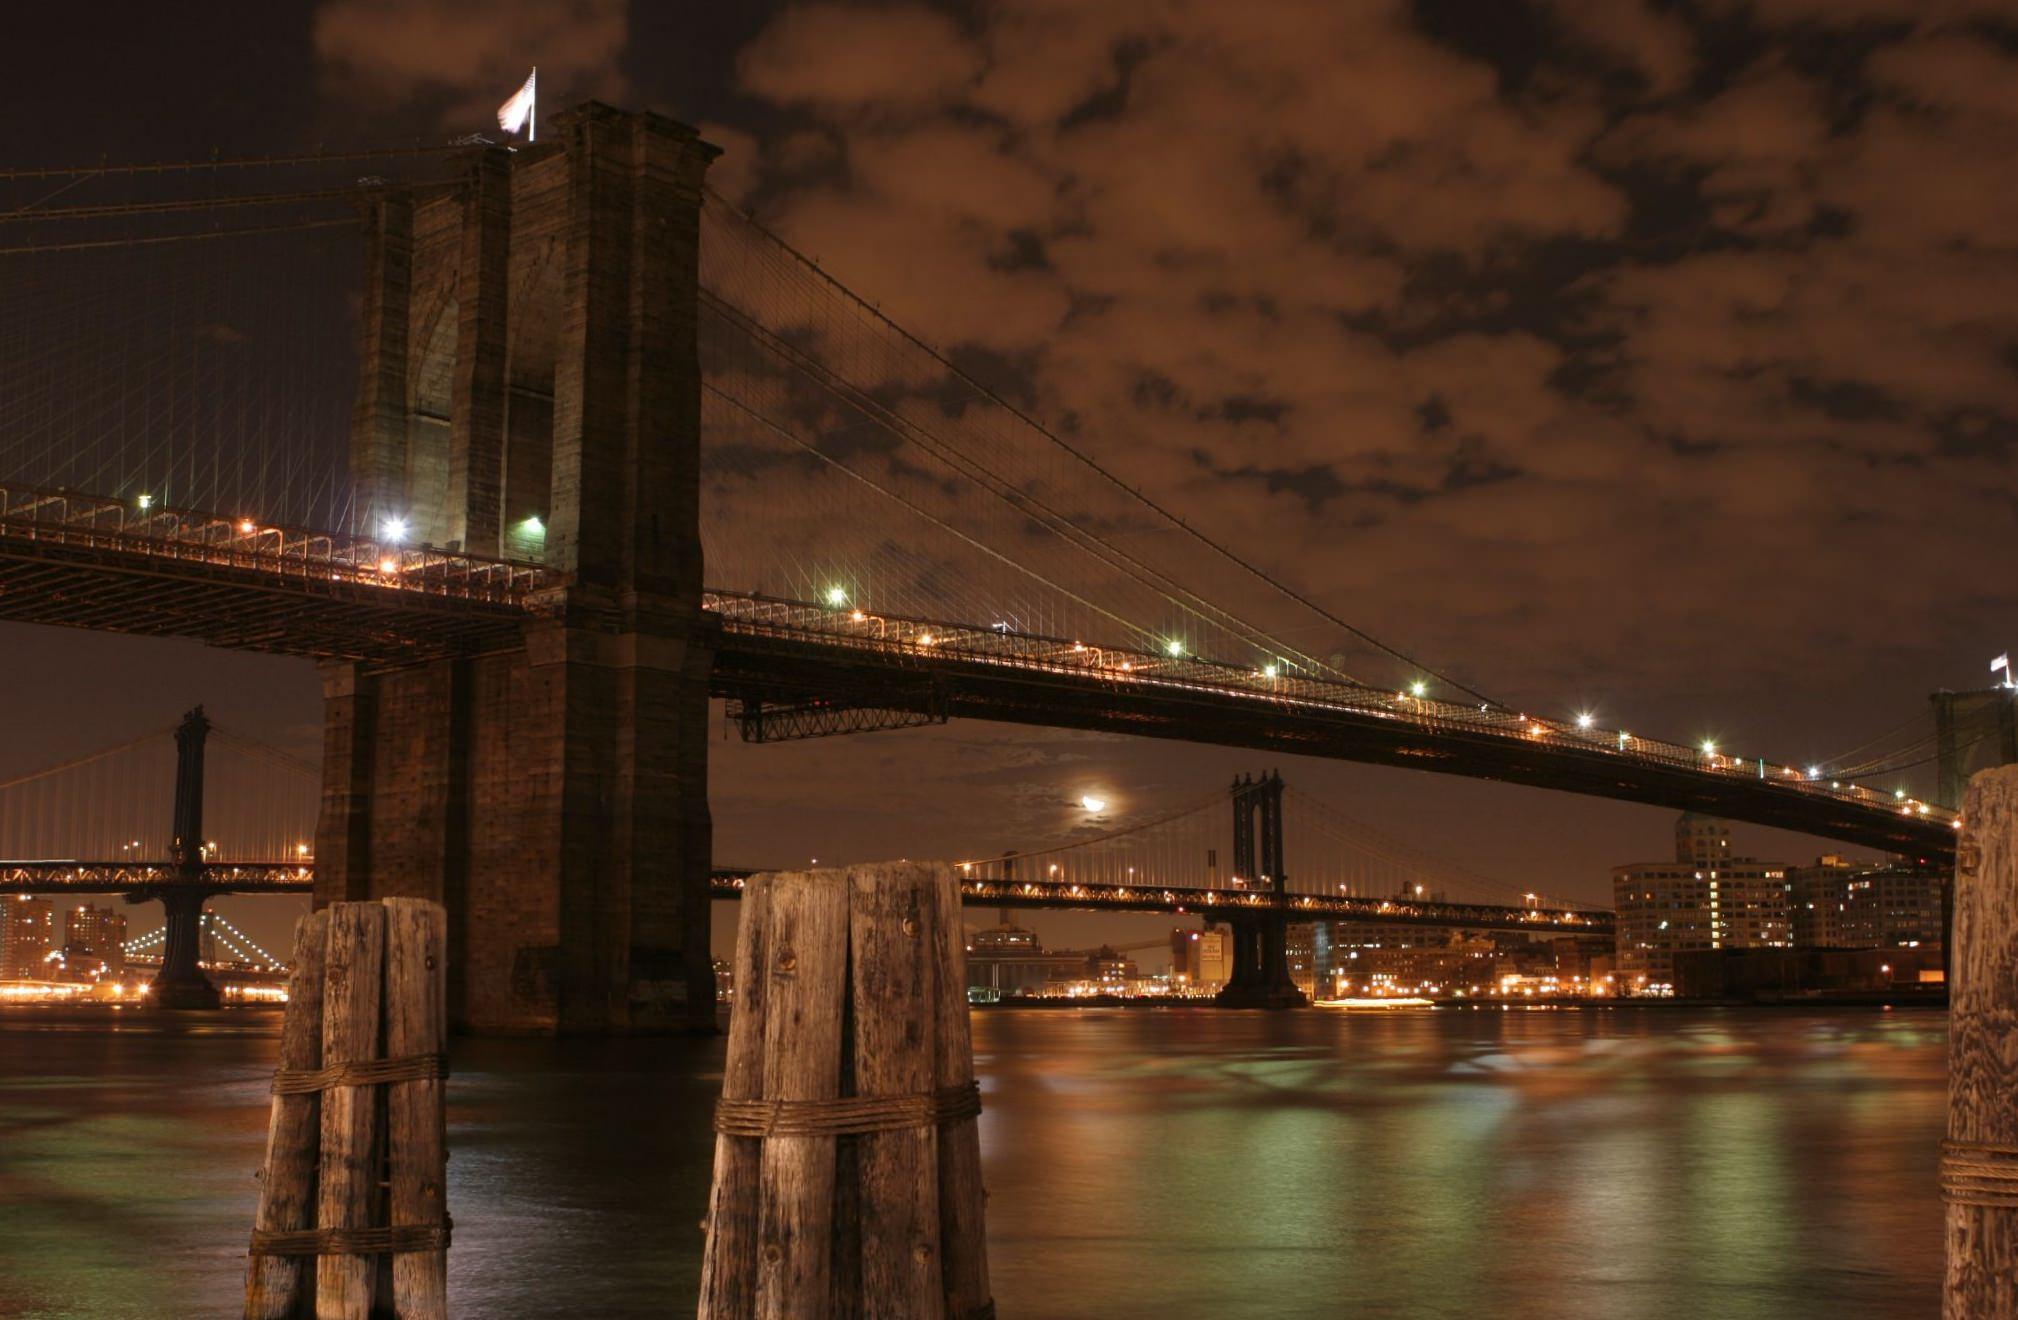 Brooklyn Bridge at Night image